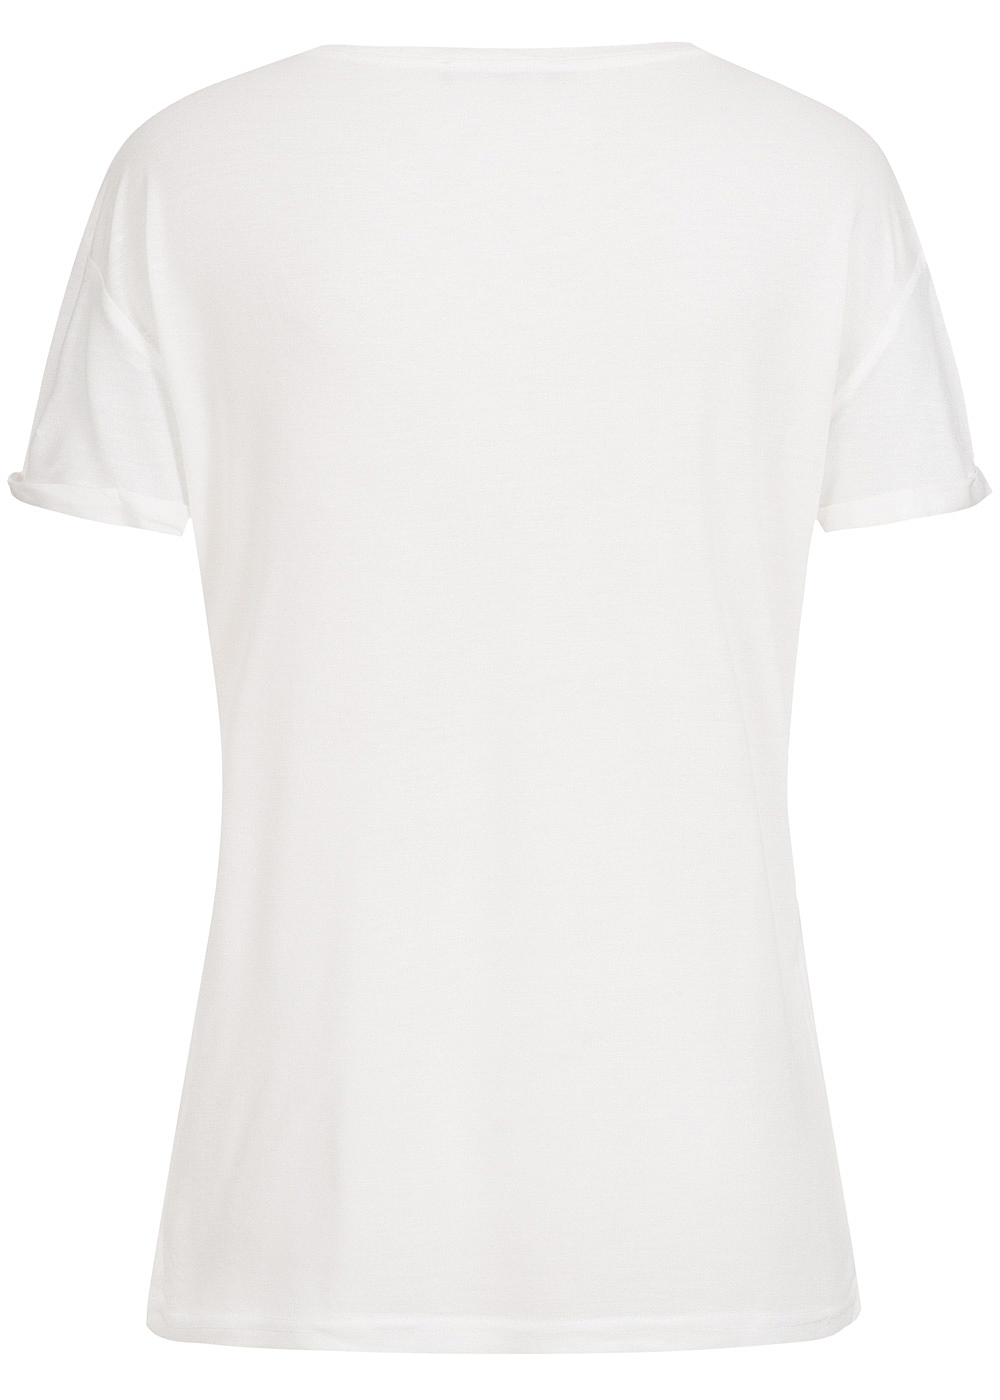 Eight2nine damen t shirt kurzarm summer magazin print by for T shirt printing one off